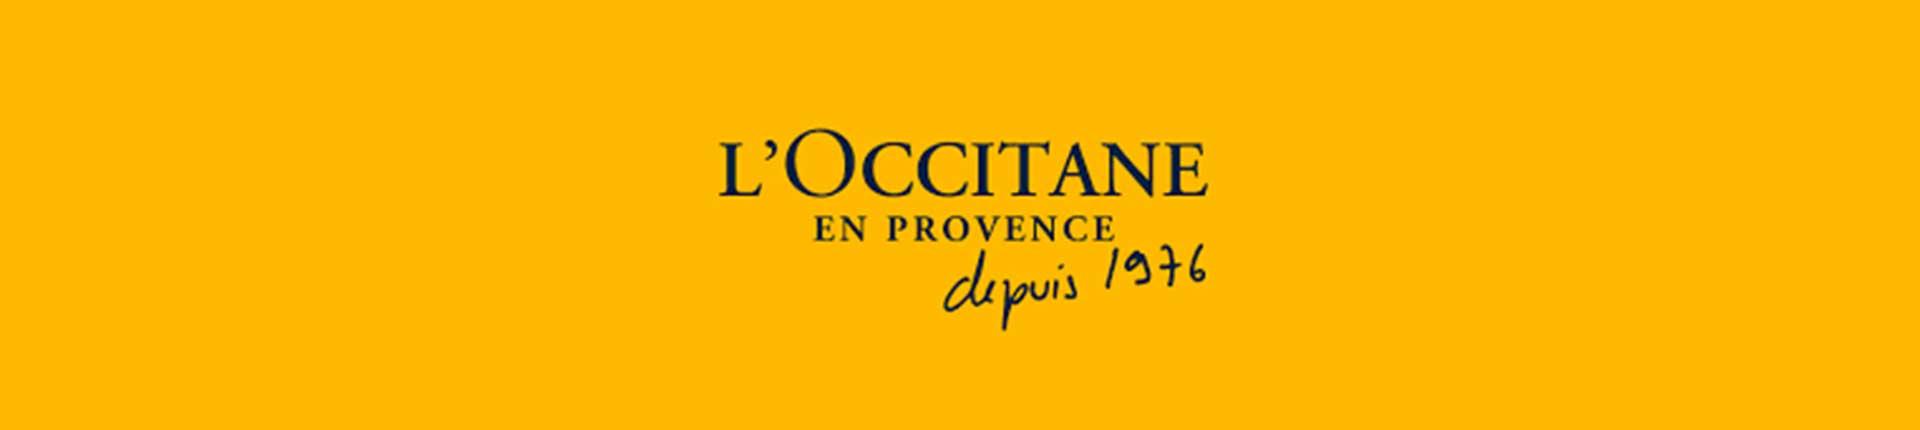 L'Occitane códigos descuentoL'Occitane códigos descuento